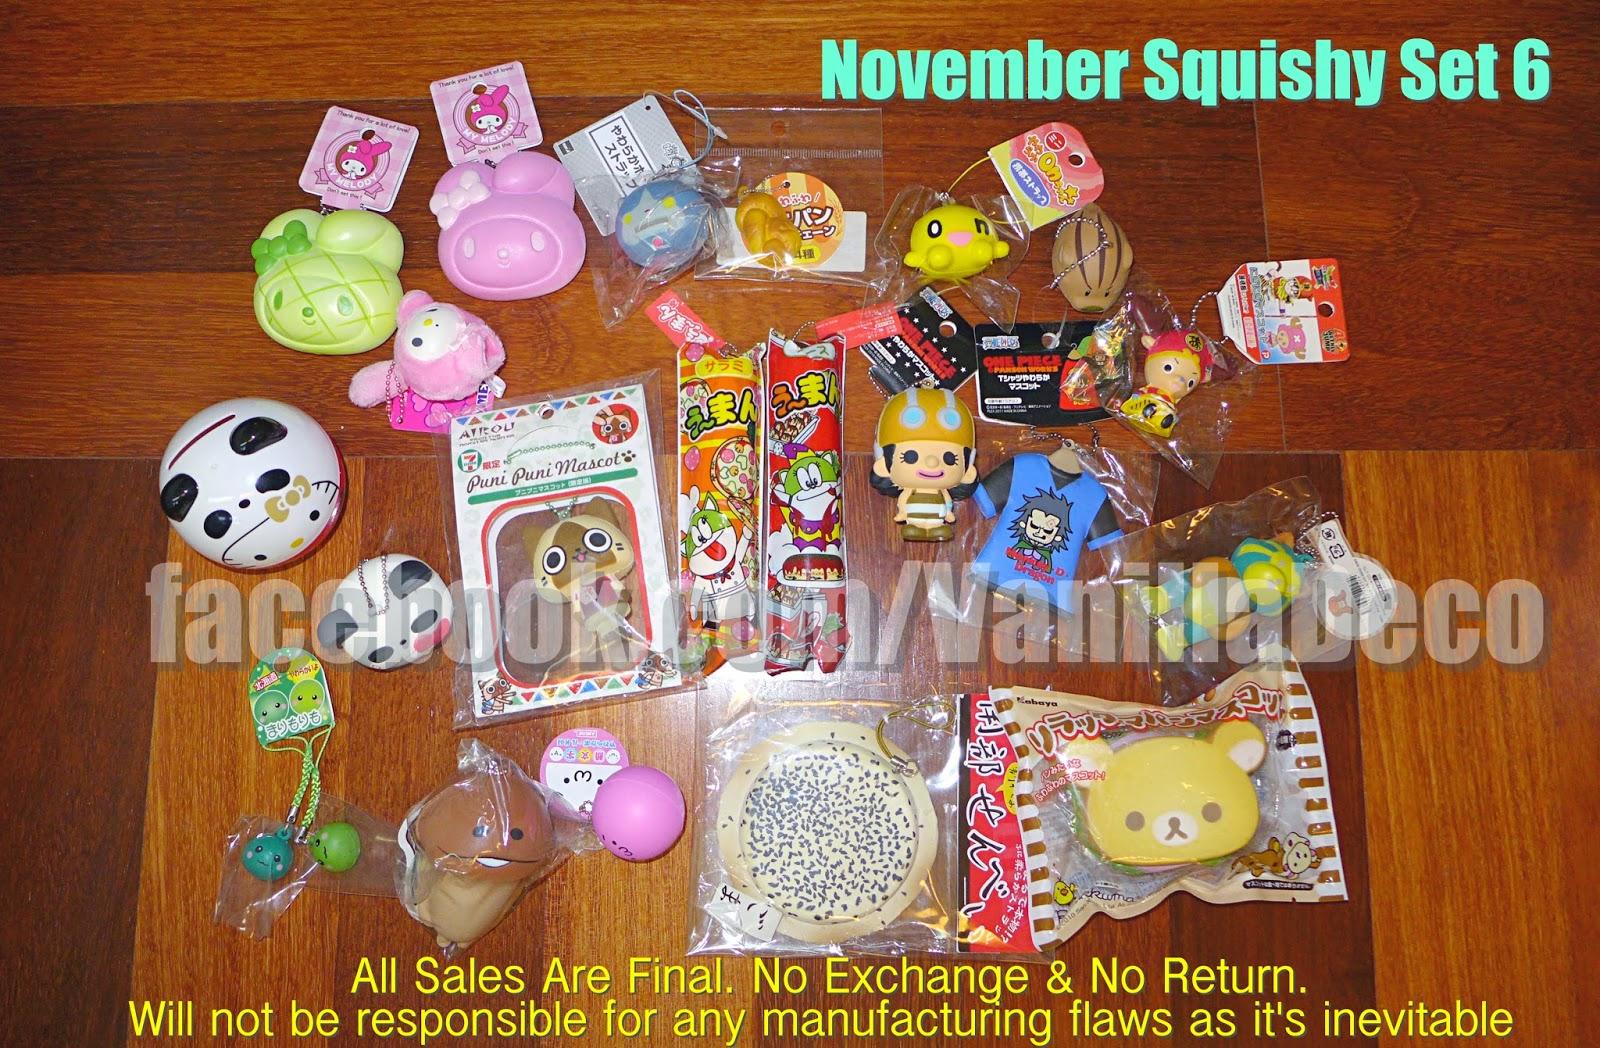 Squishy Haul Blog : Sue s Cutie Closet : Squishy Update: One Piece Luffy & Chopper Set, Chopper Man T-Shirt Set, Pom ...